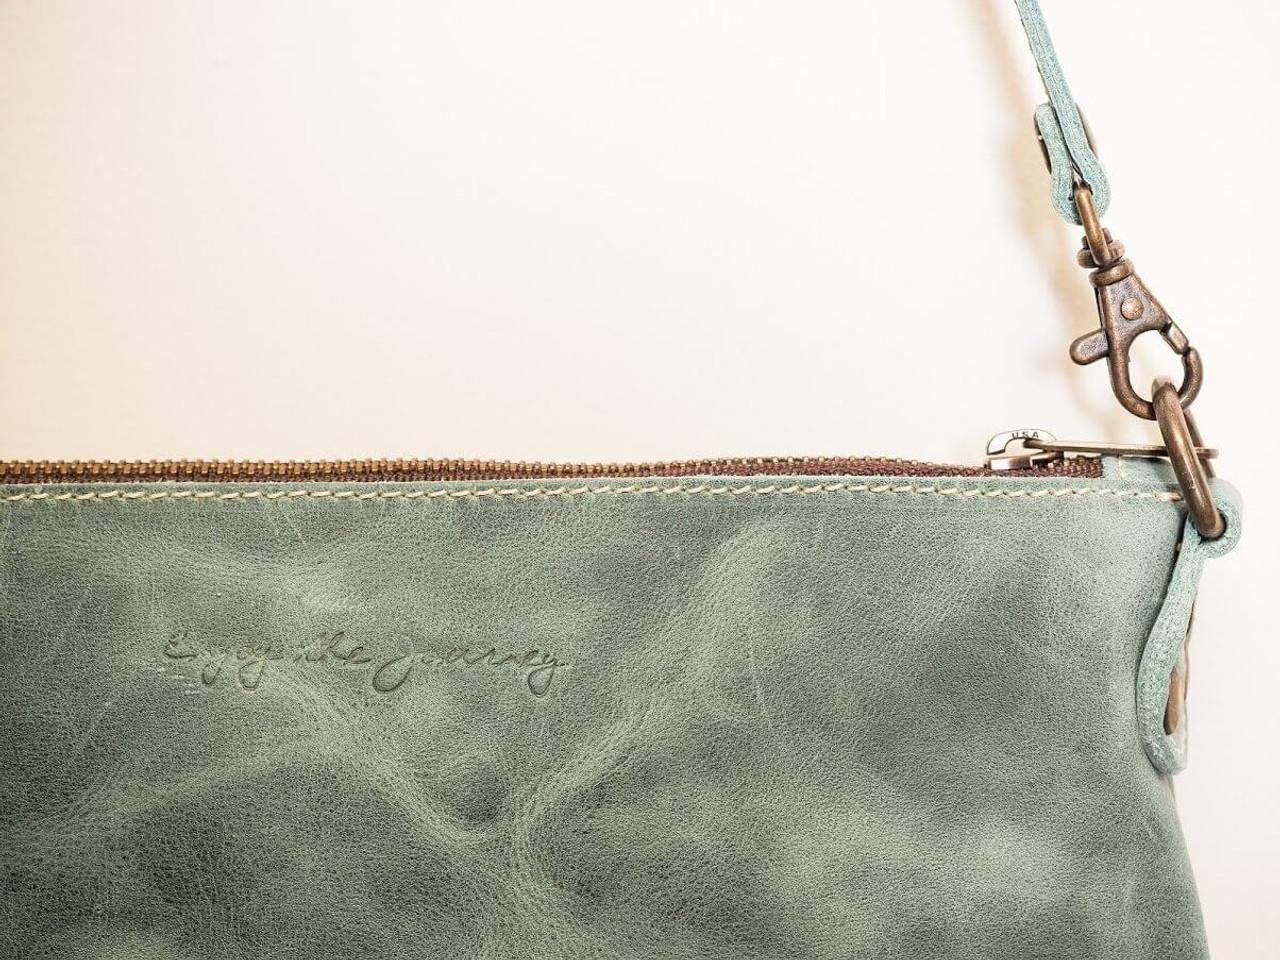 Large Crossbody Handbag in Turquoise